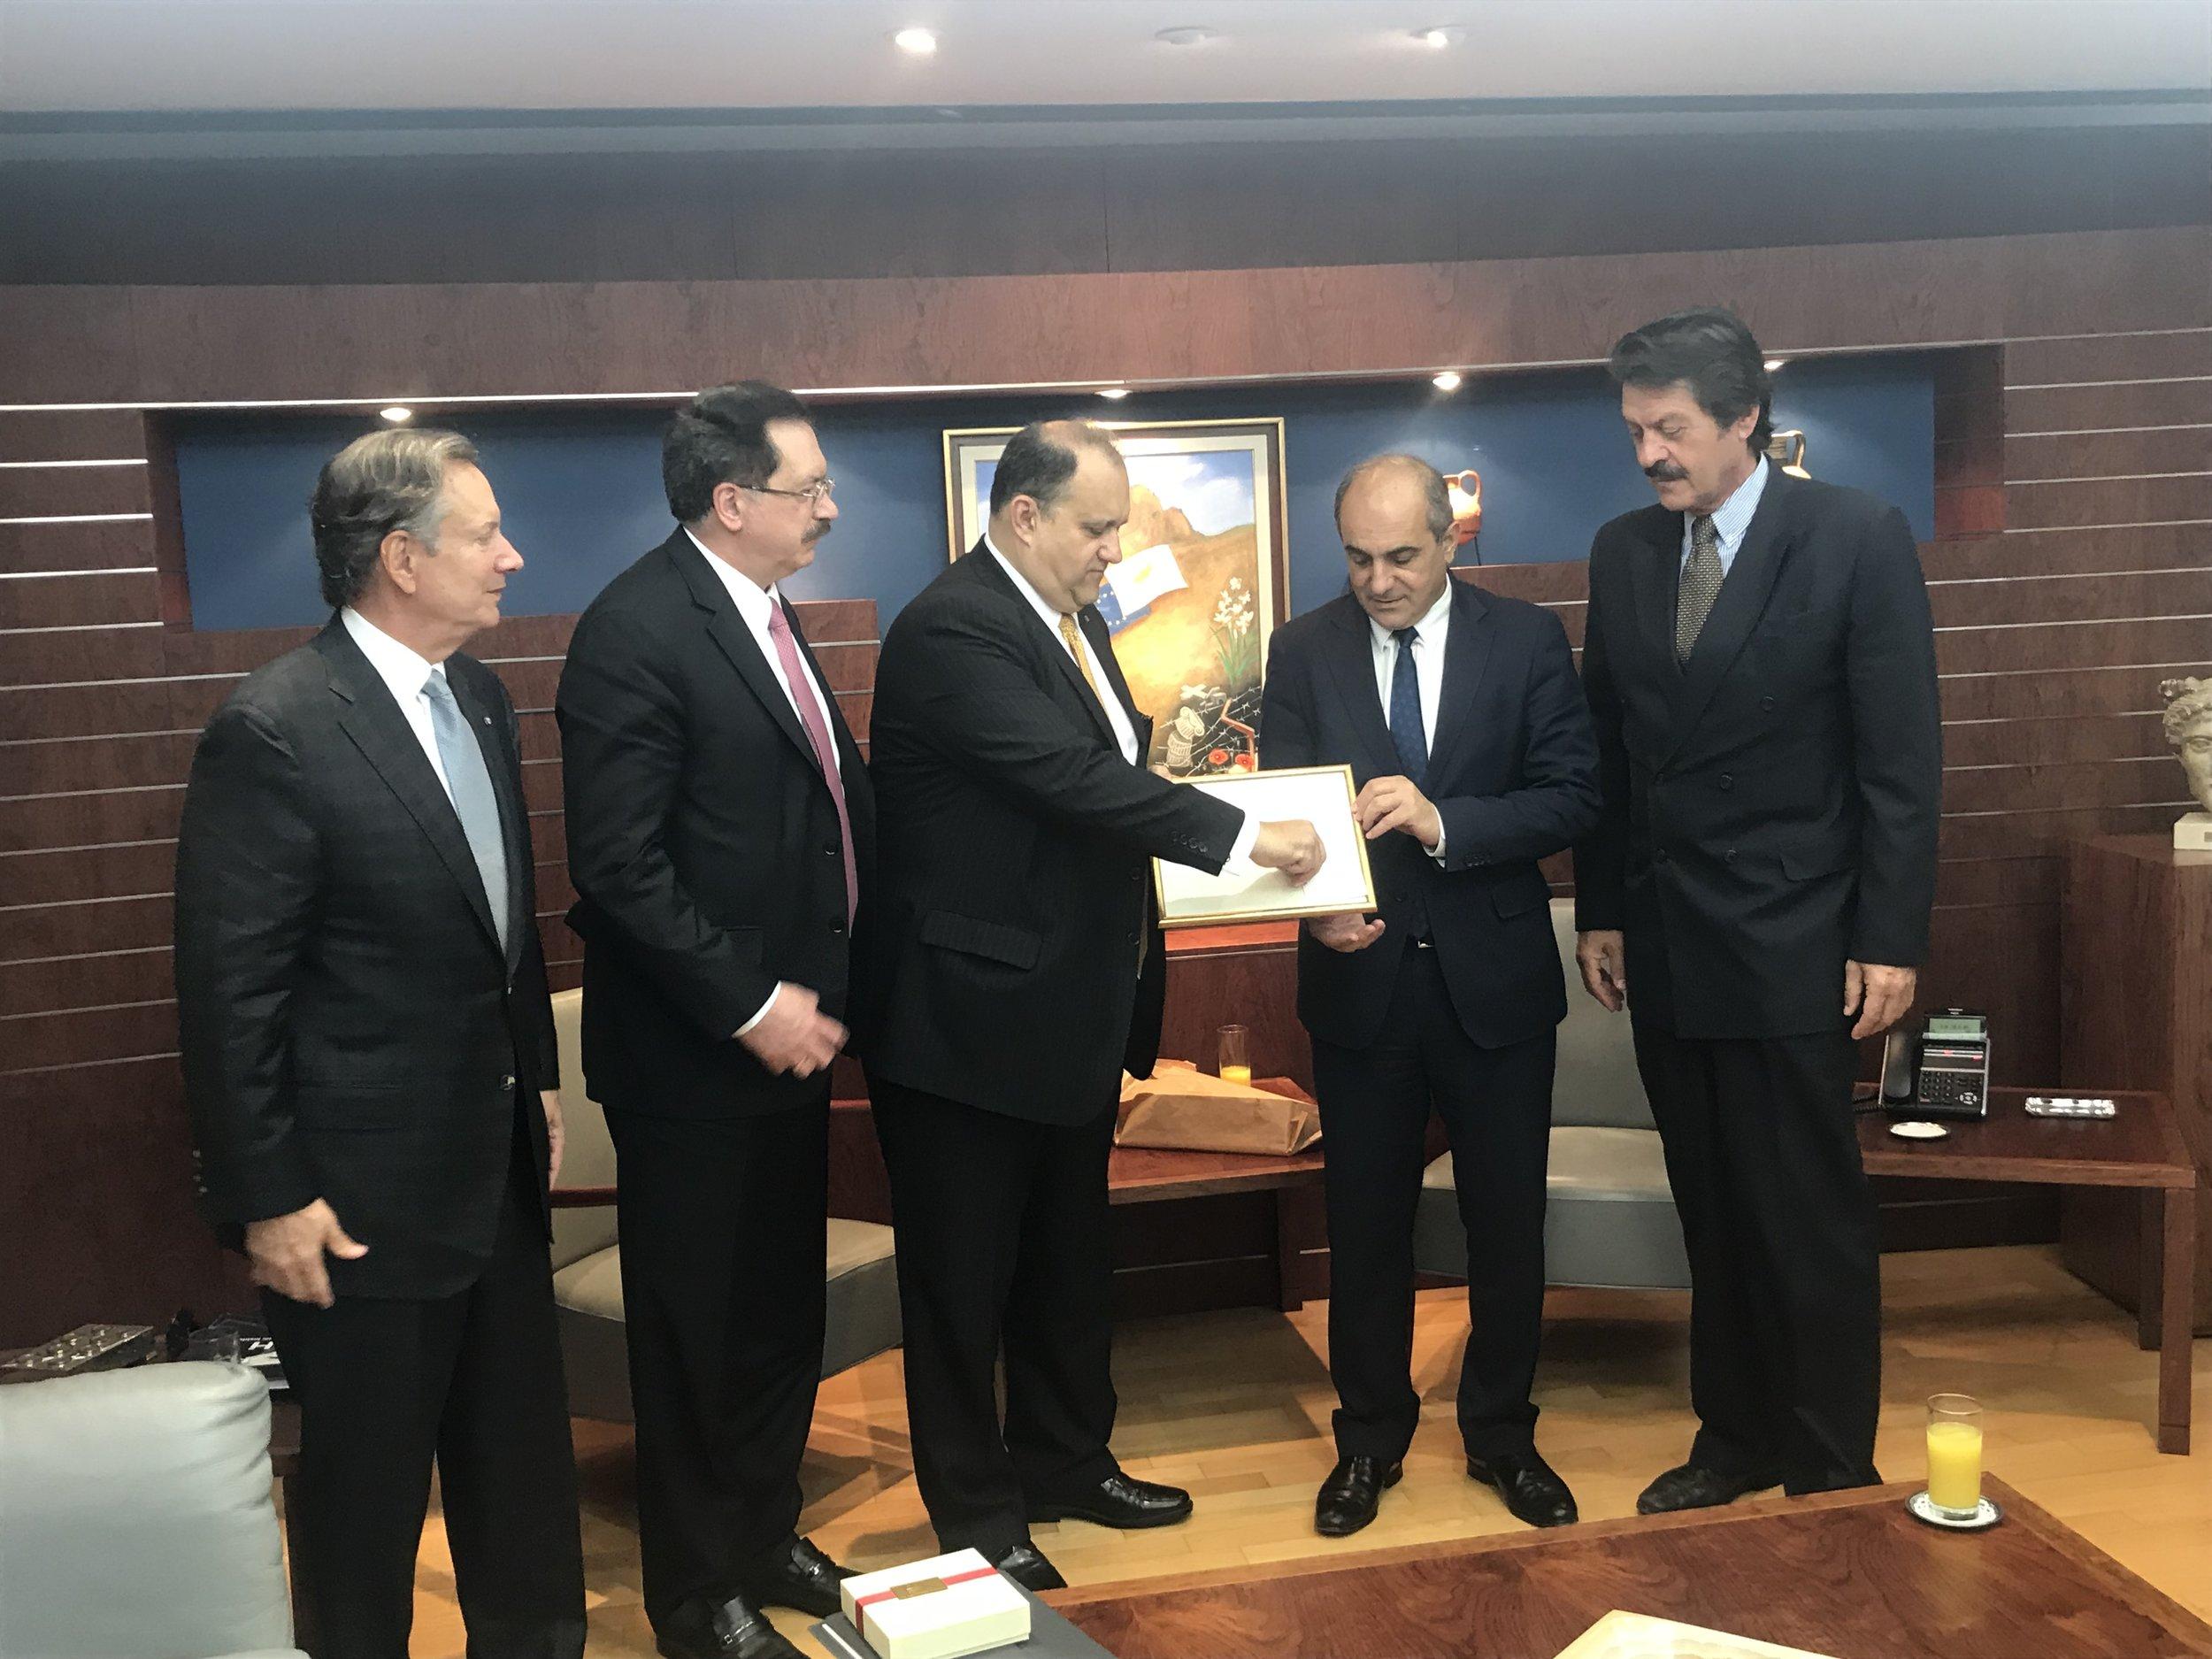 AHI Delegation with MP Demetris Syllouris, President of the House of Representatives.